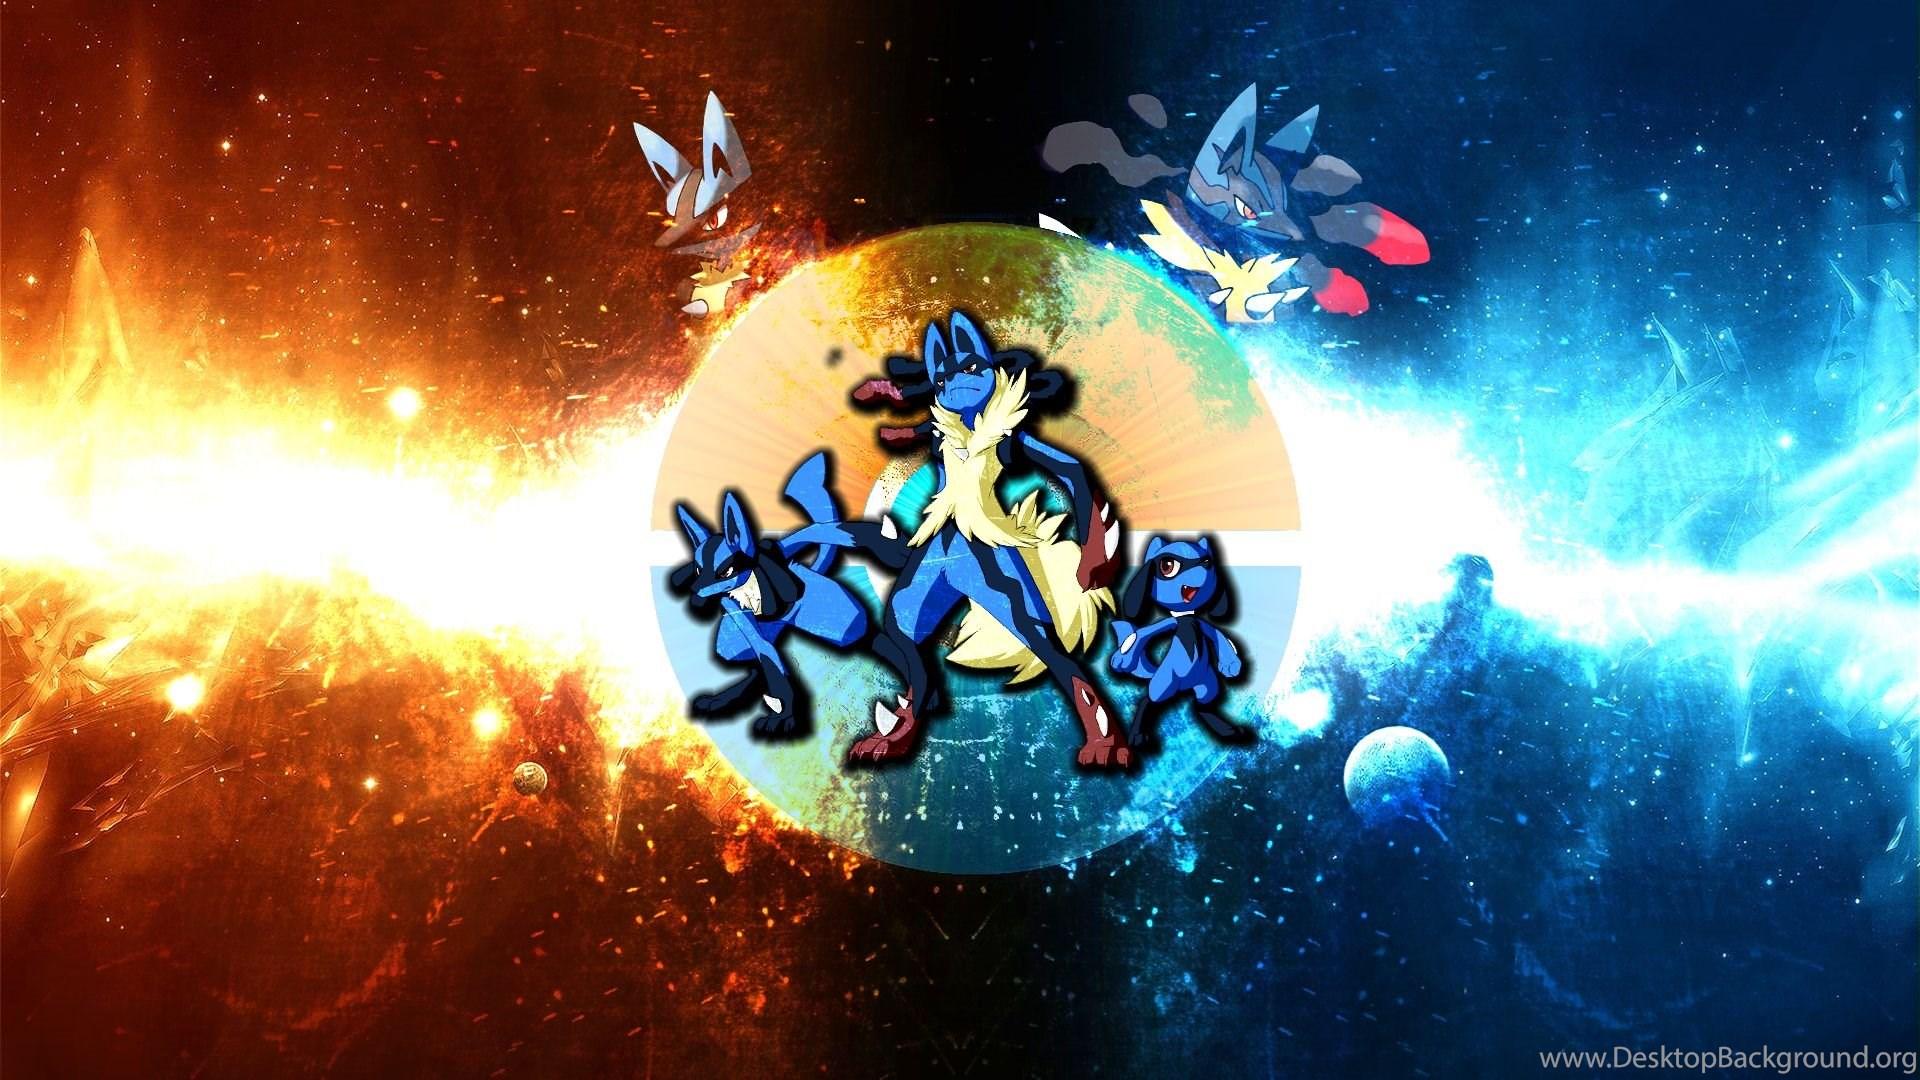 Mega Blaziken VS Lucario Wallpapers By FRUITYNITE On DeviantArt